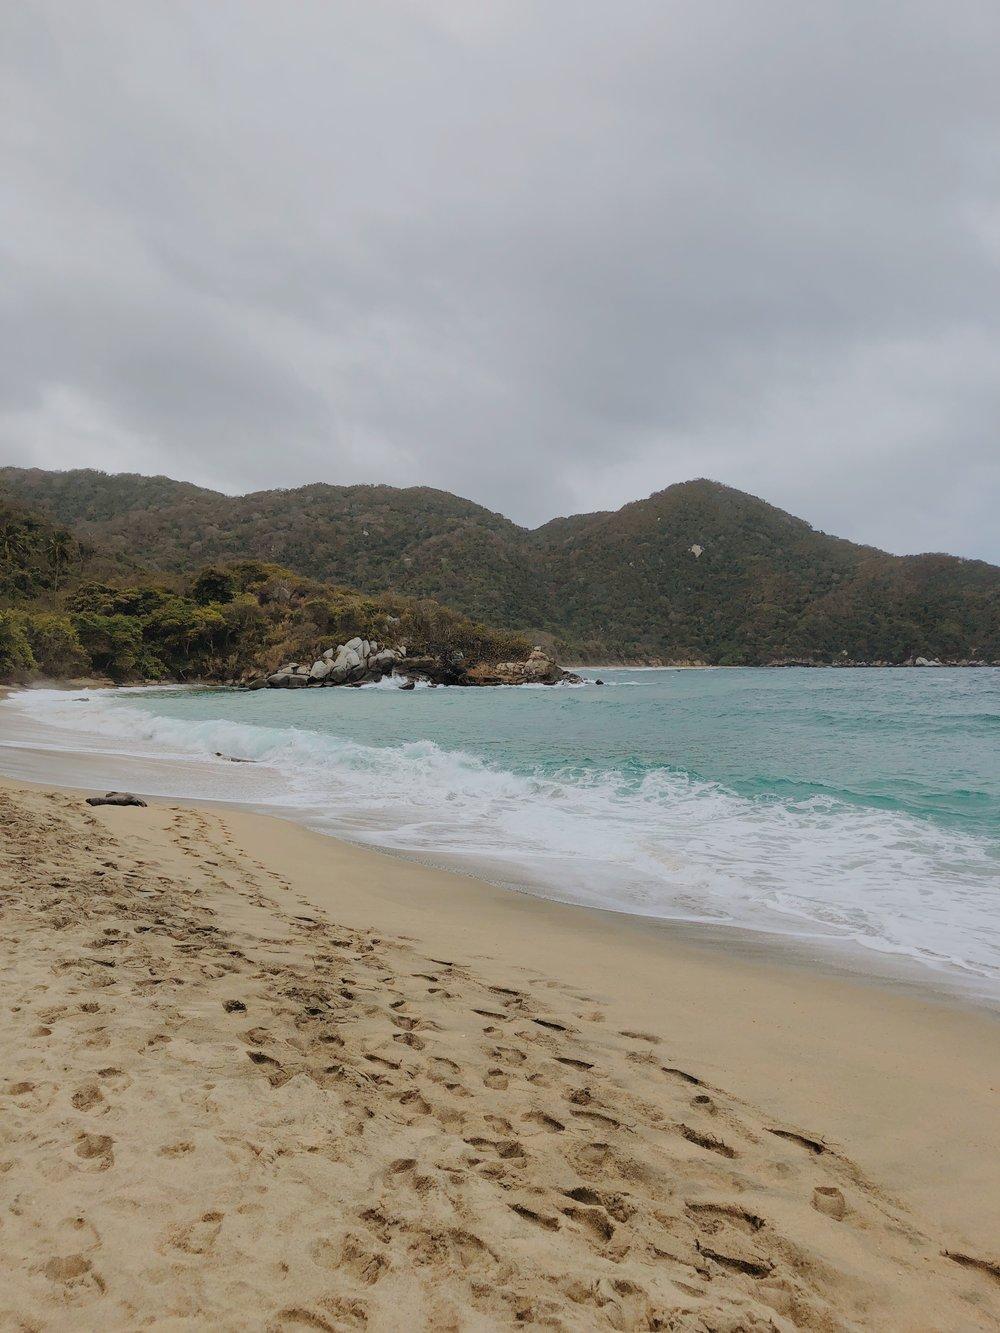 Nude Beach in Tayrona